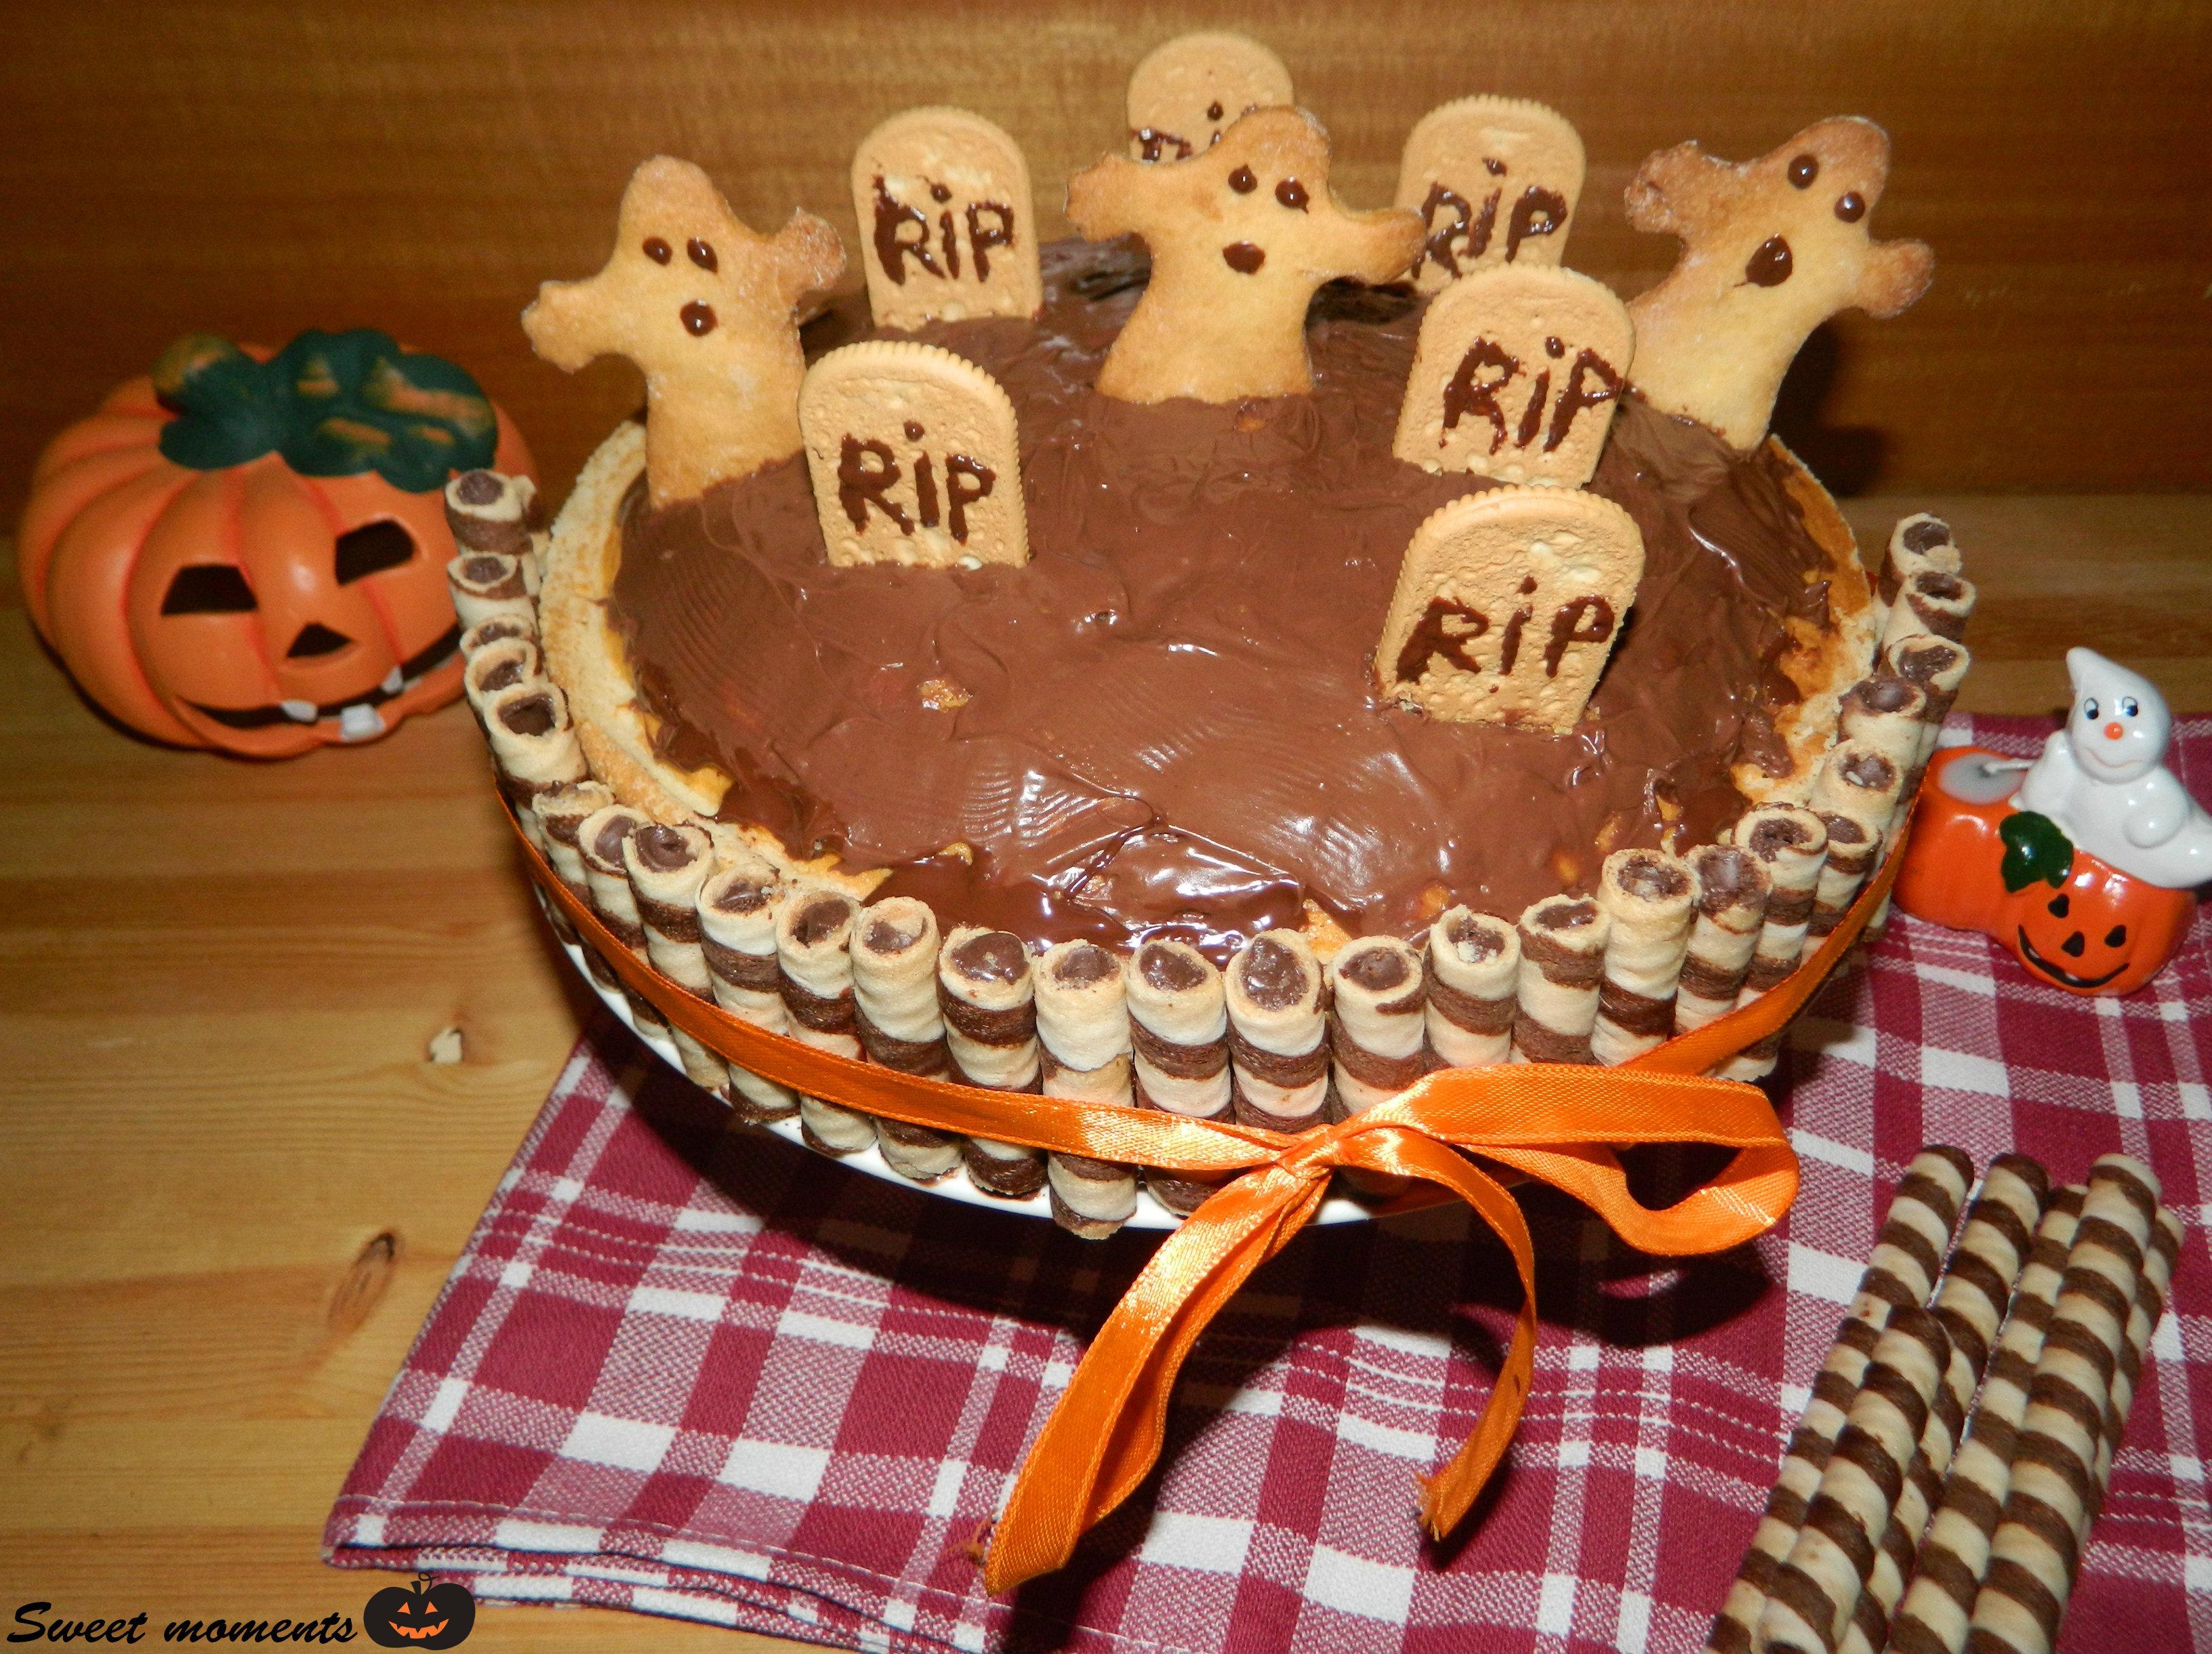 Torta margherita mostruosa